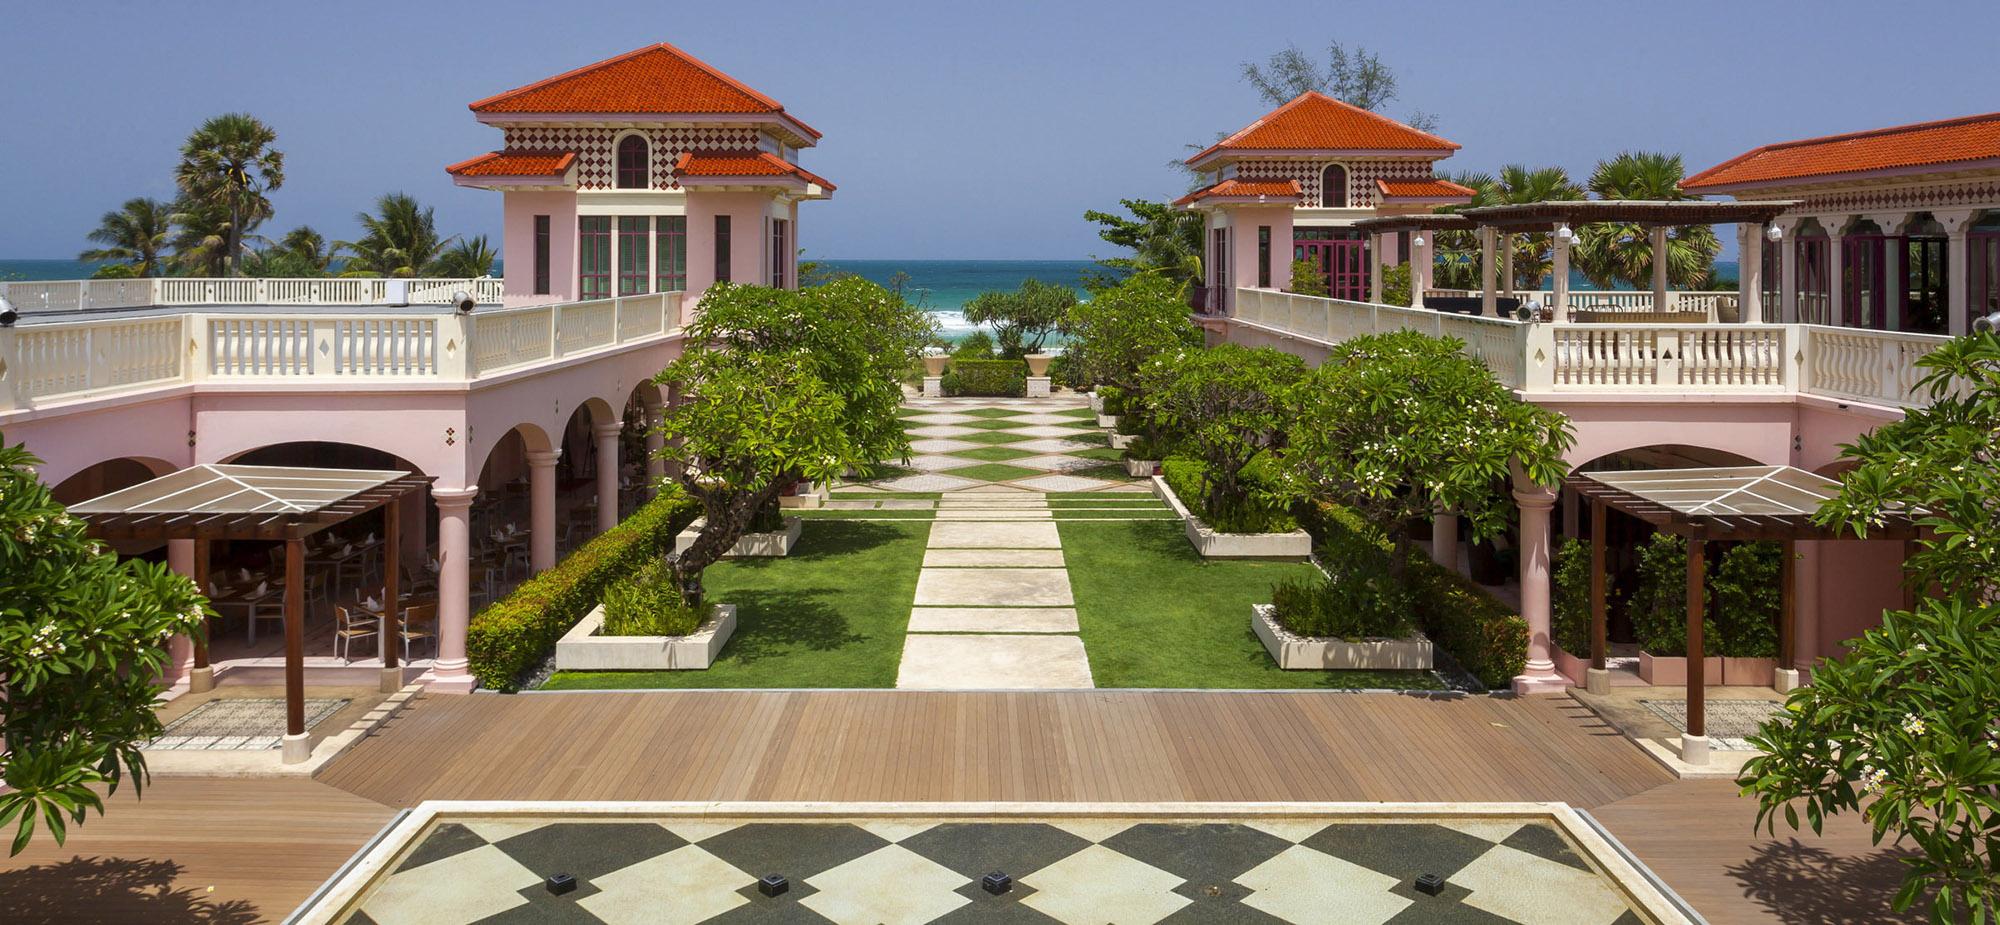 Centara Grand Beach hotel